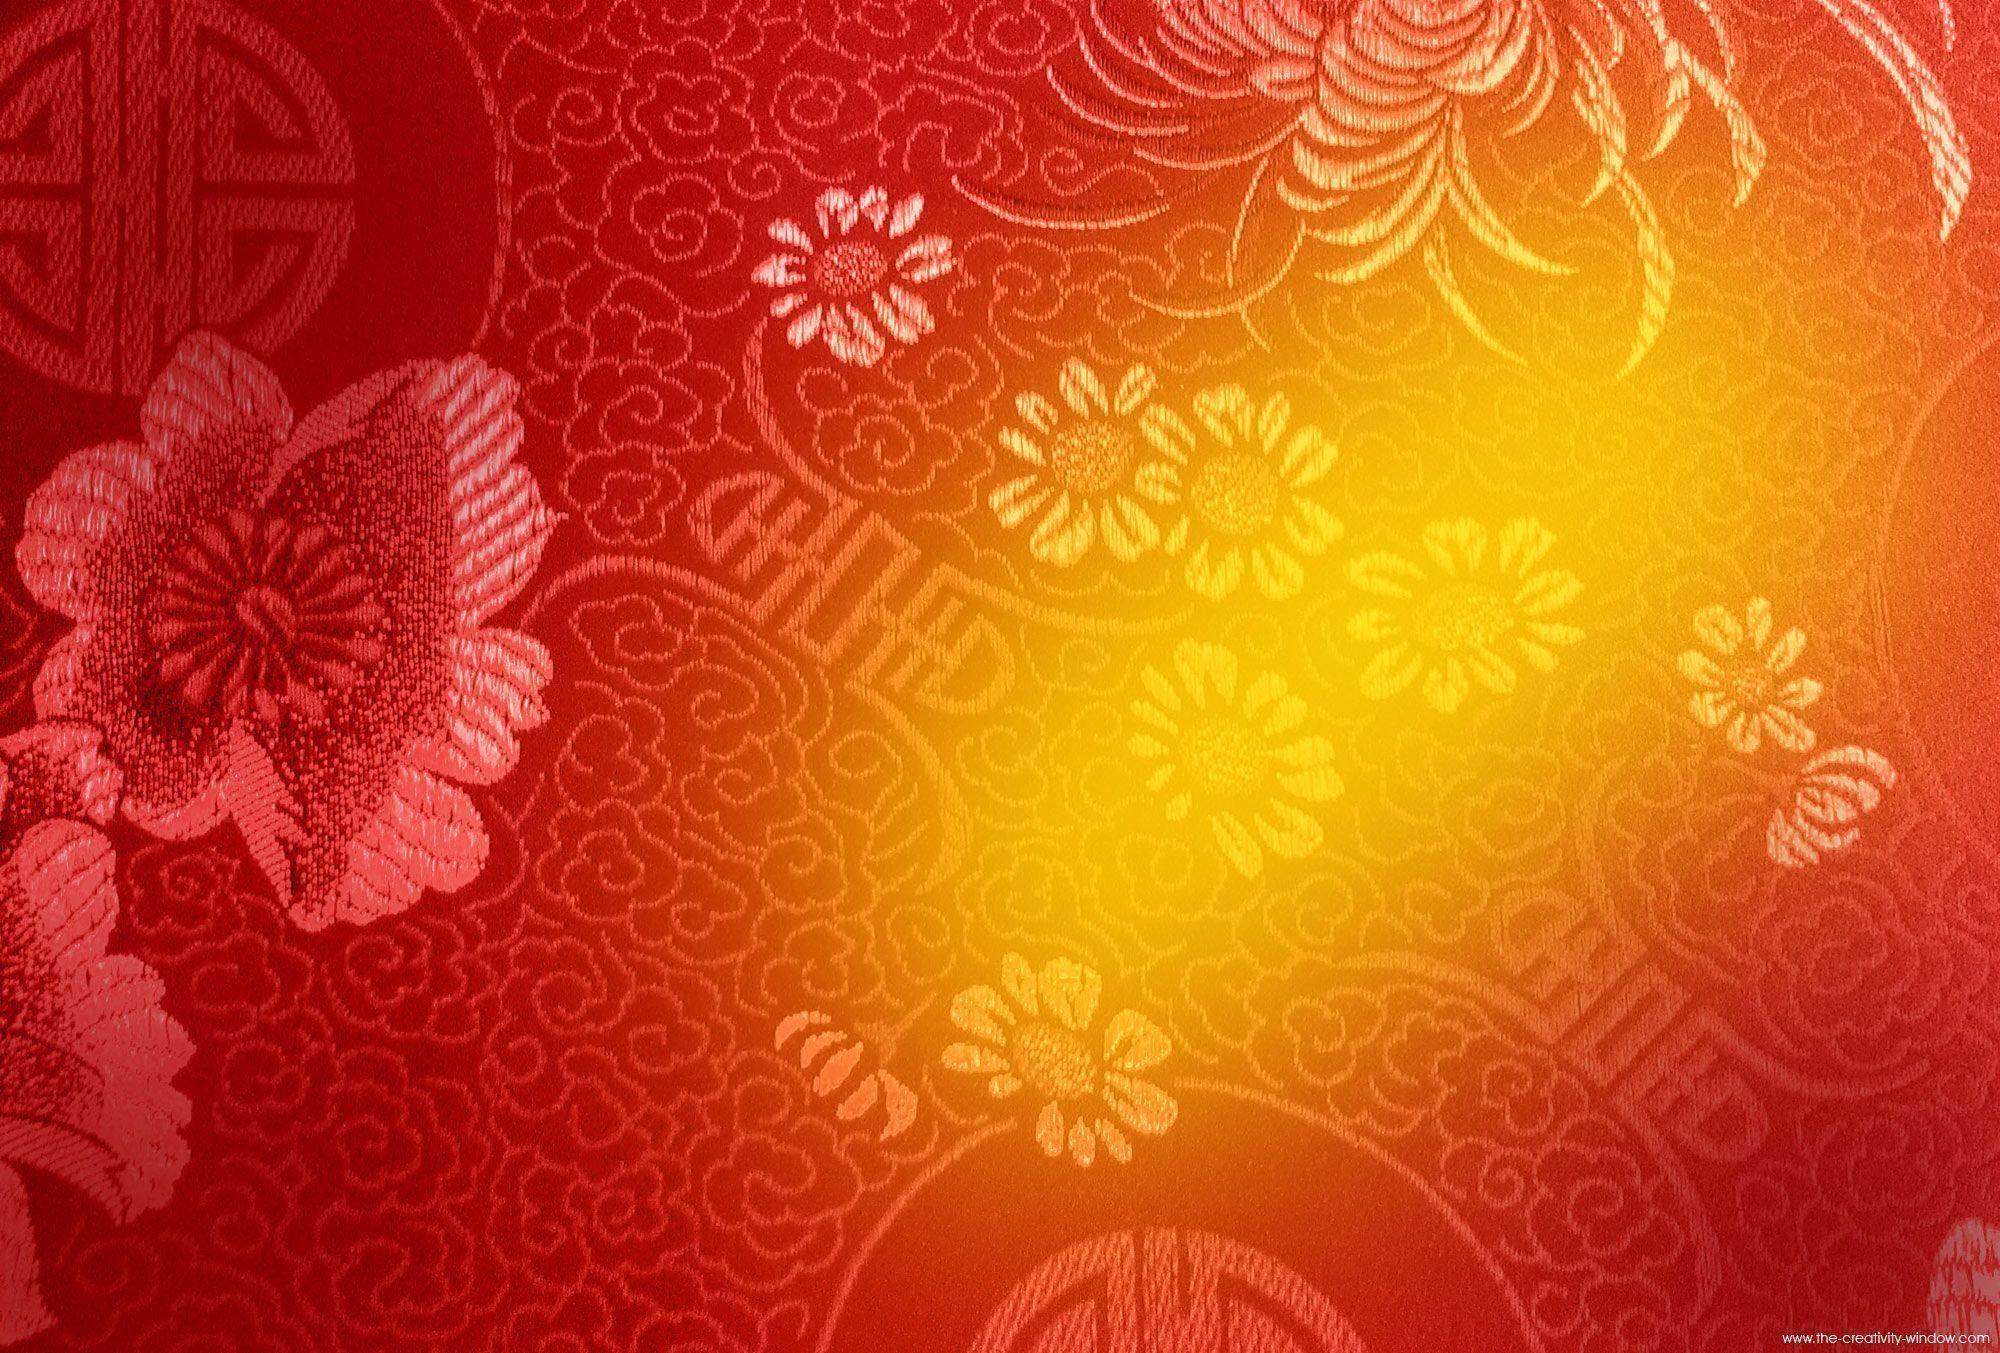 <b>Chinese New Year</b> 2016 <b>Wallpapers<